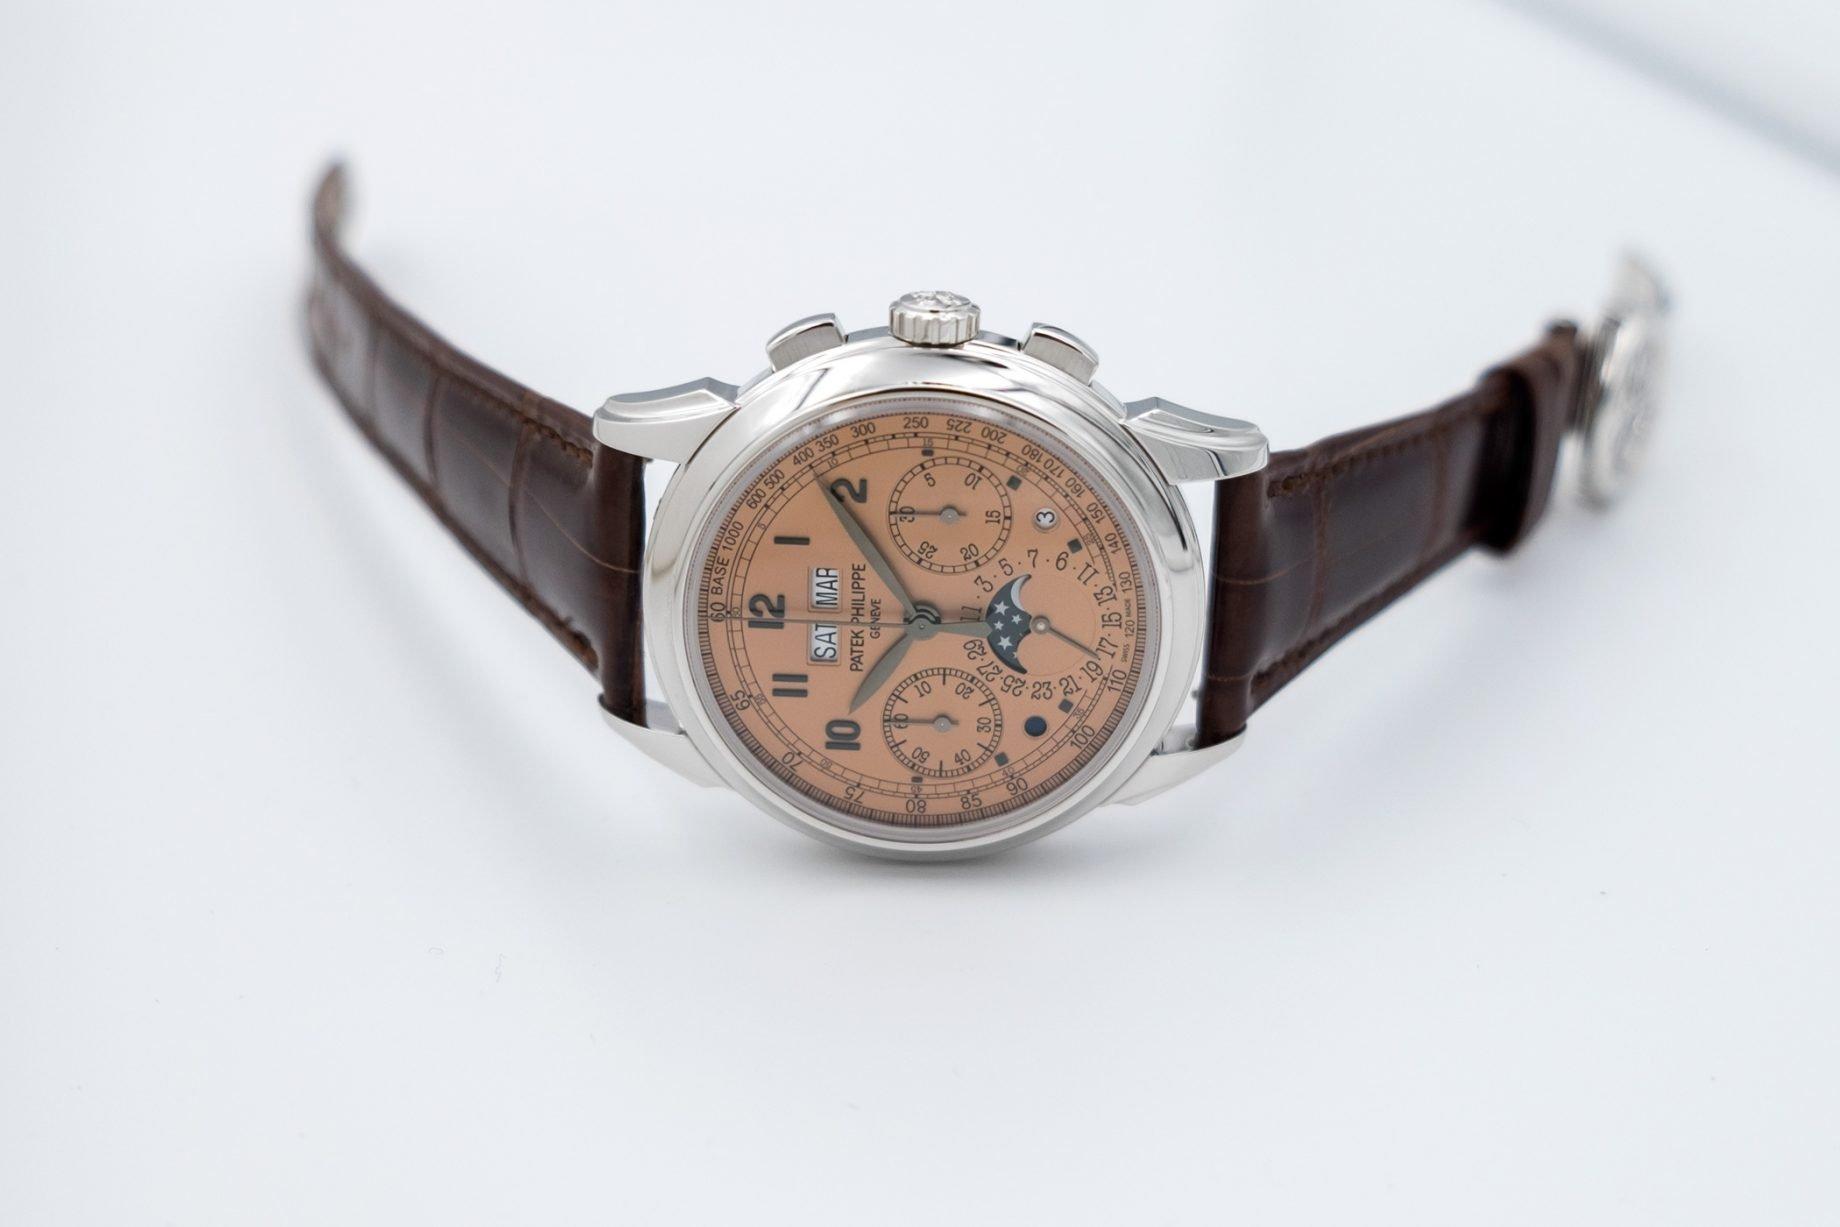 Patek Philippe Chronograph Perpetual Calendar Ref.5207P-001